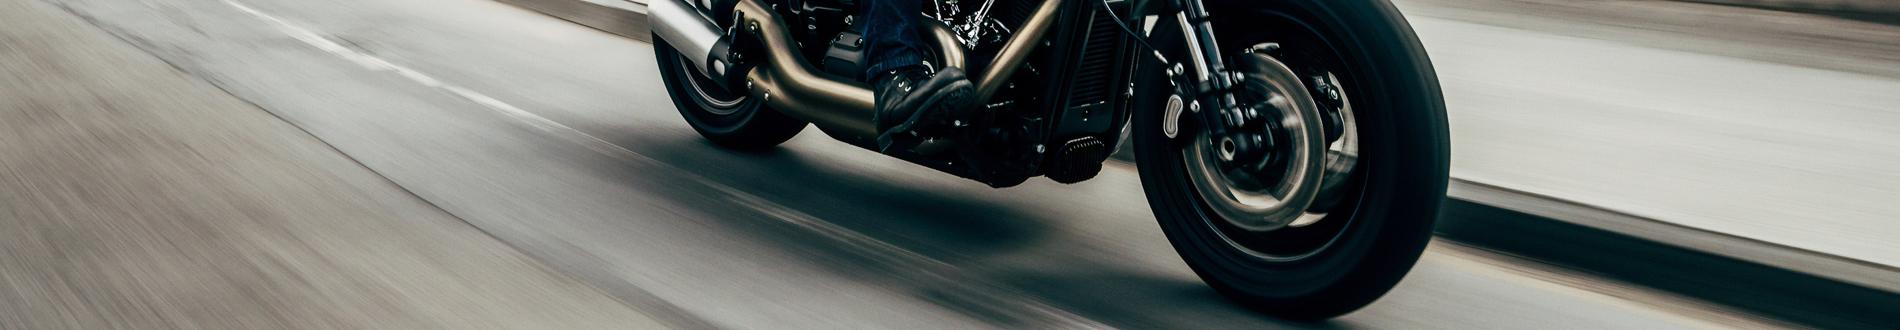 motosiklet-kaskosu